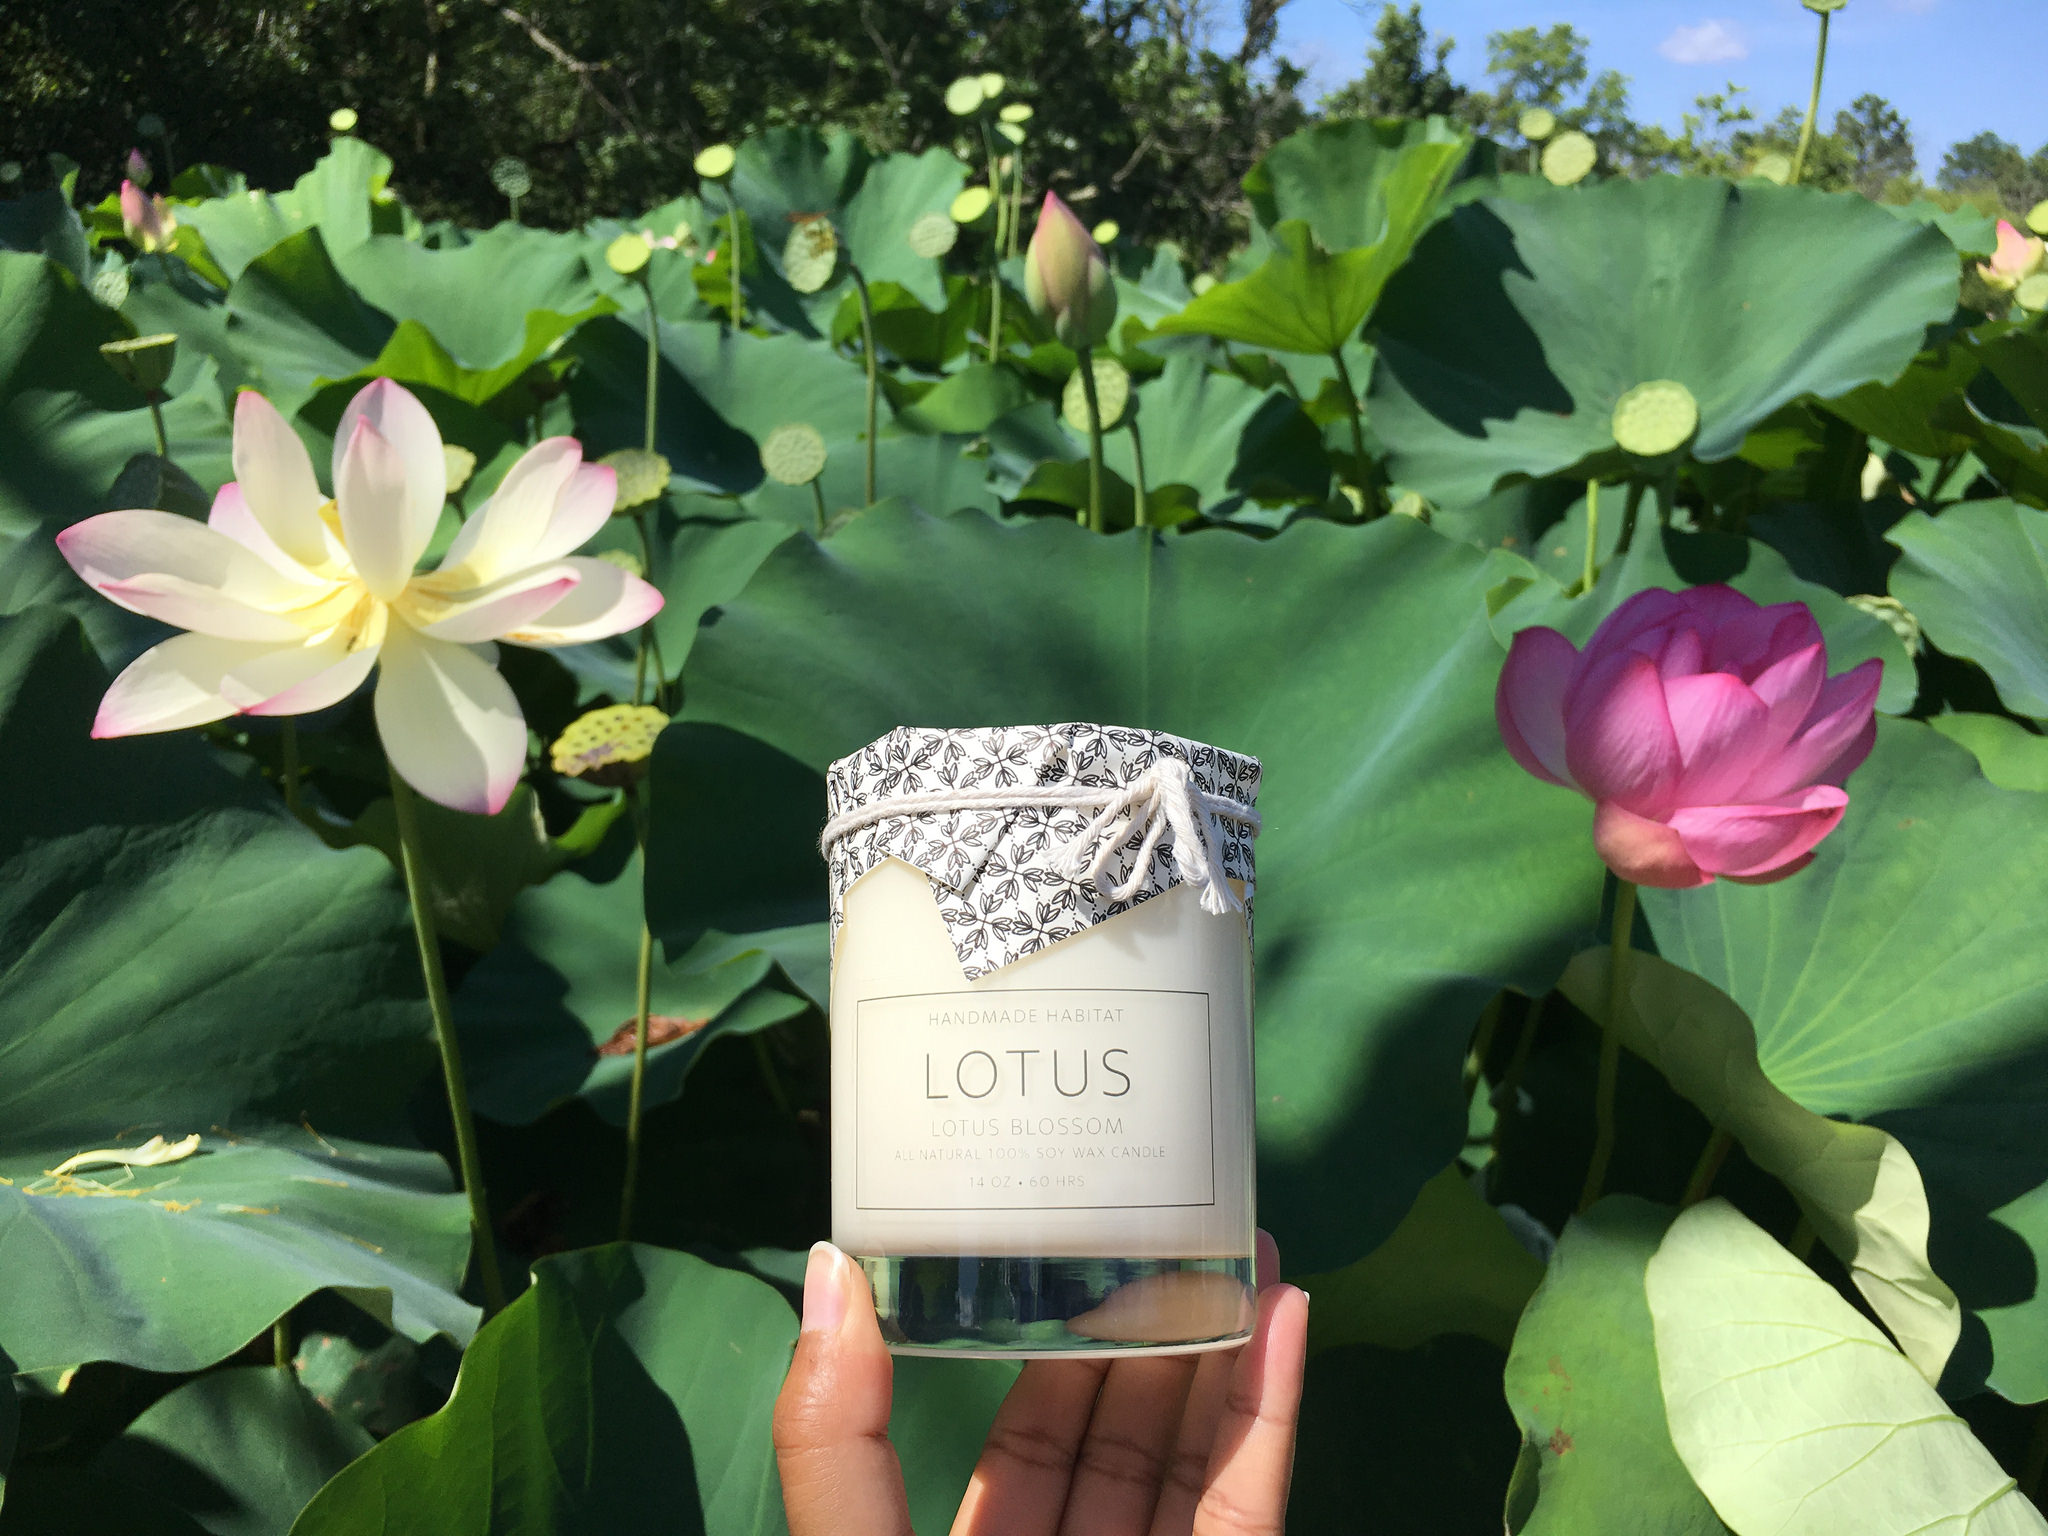 Handmade habitat summer lotus adventures mightylinksfo